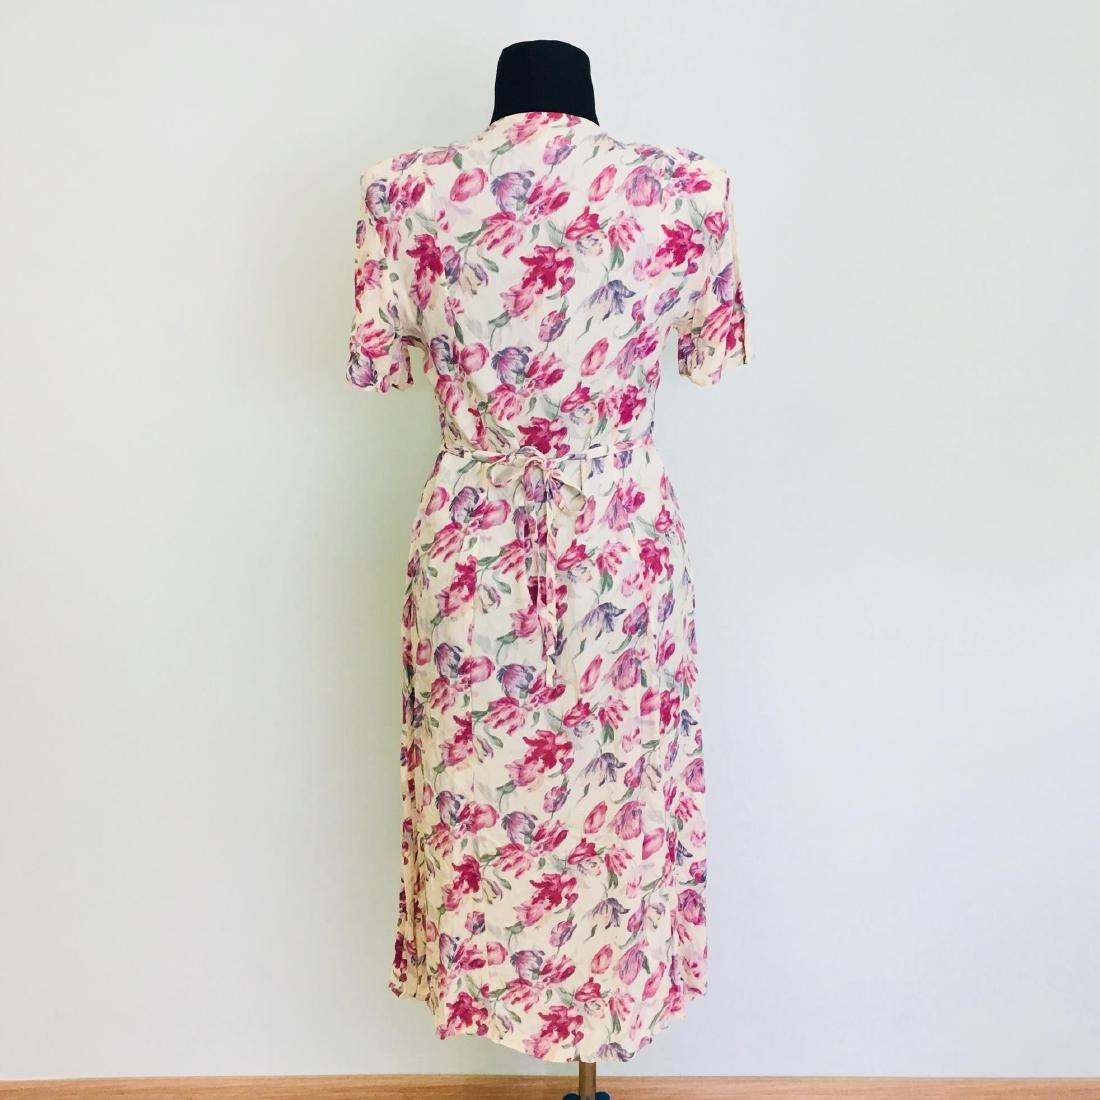 Vintage Women's Day Coctail Dress - 5